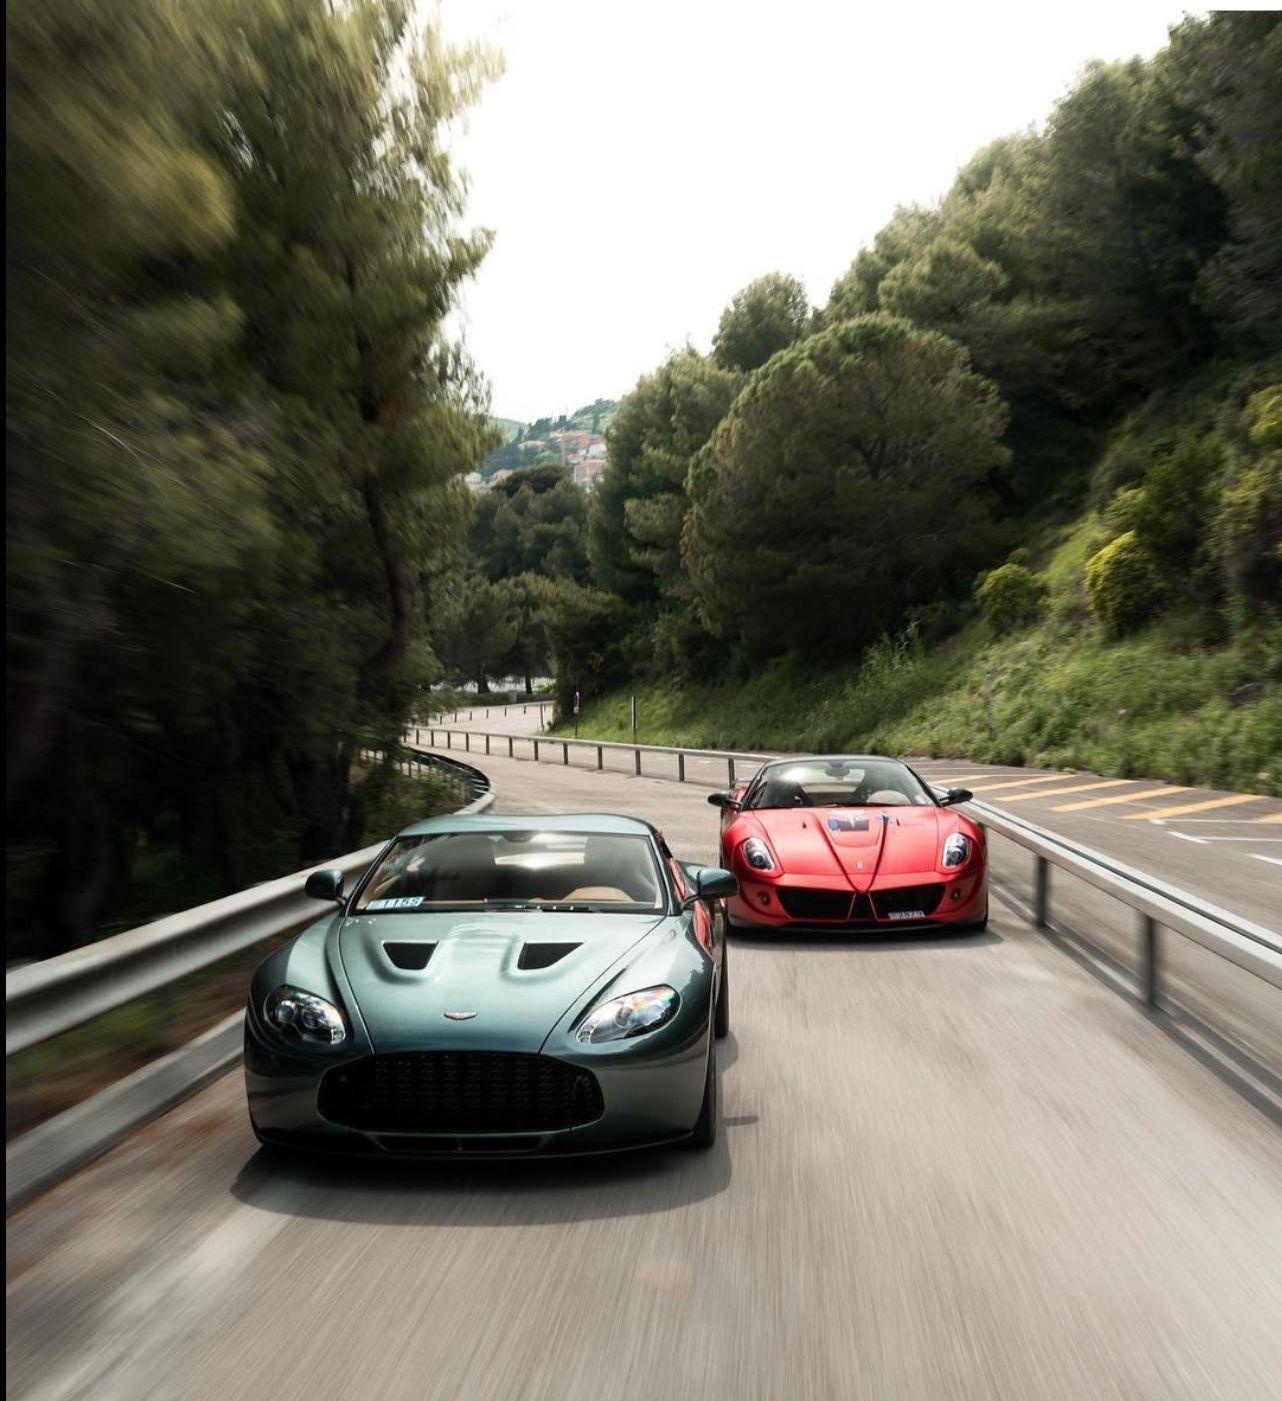 Aston Martin Cars, Aston Martin